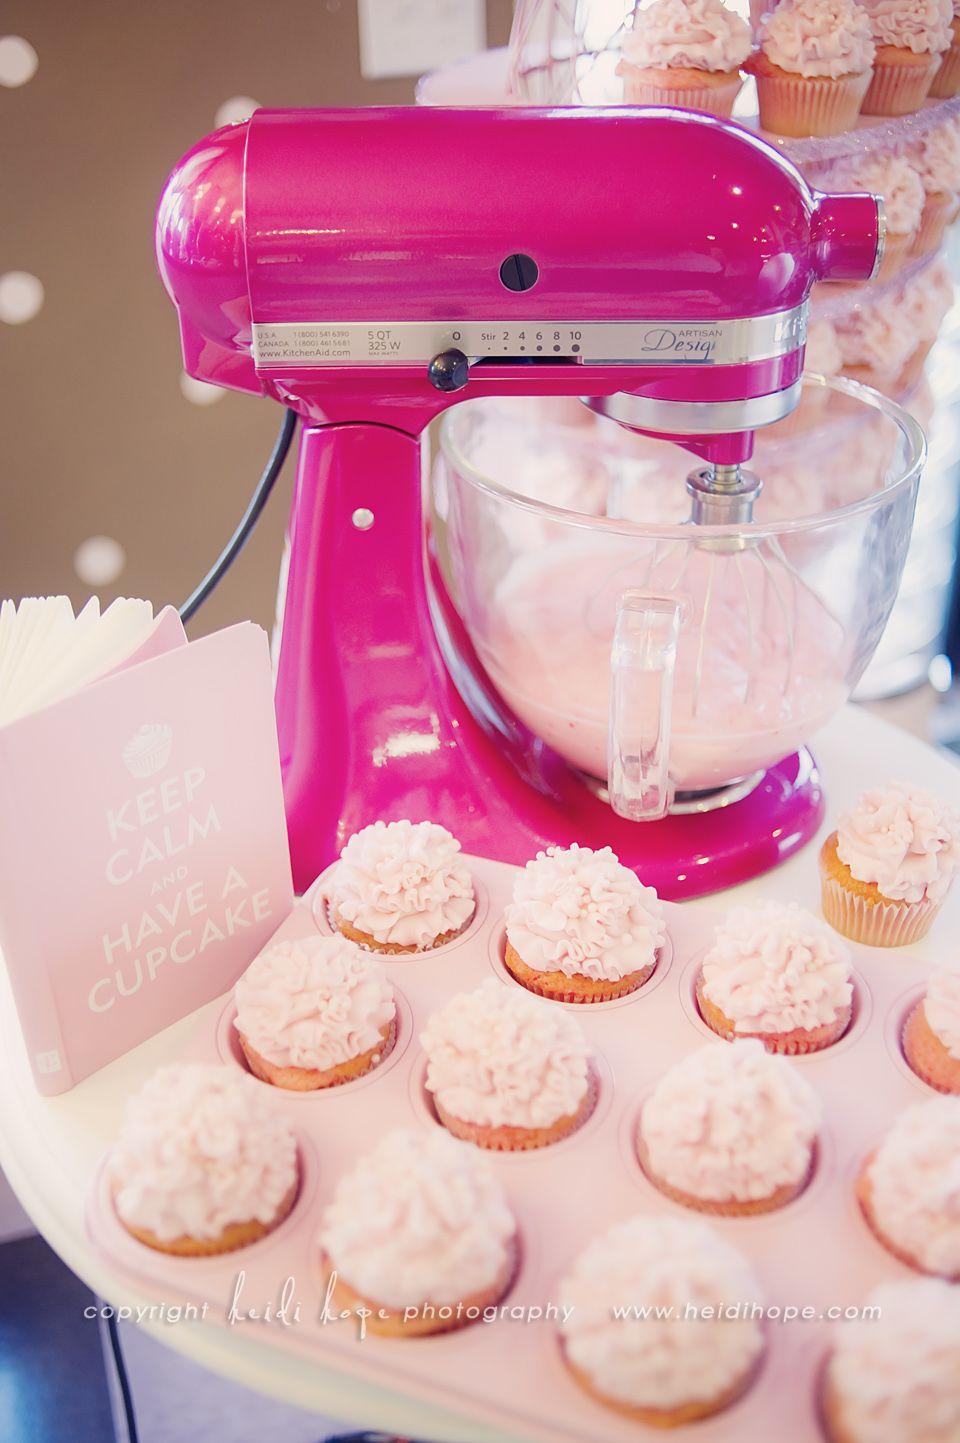 Hot Pink Kitchenaid Mixer That Sparkles I Want One Really Bad